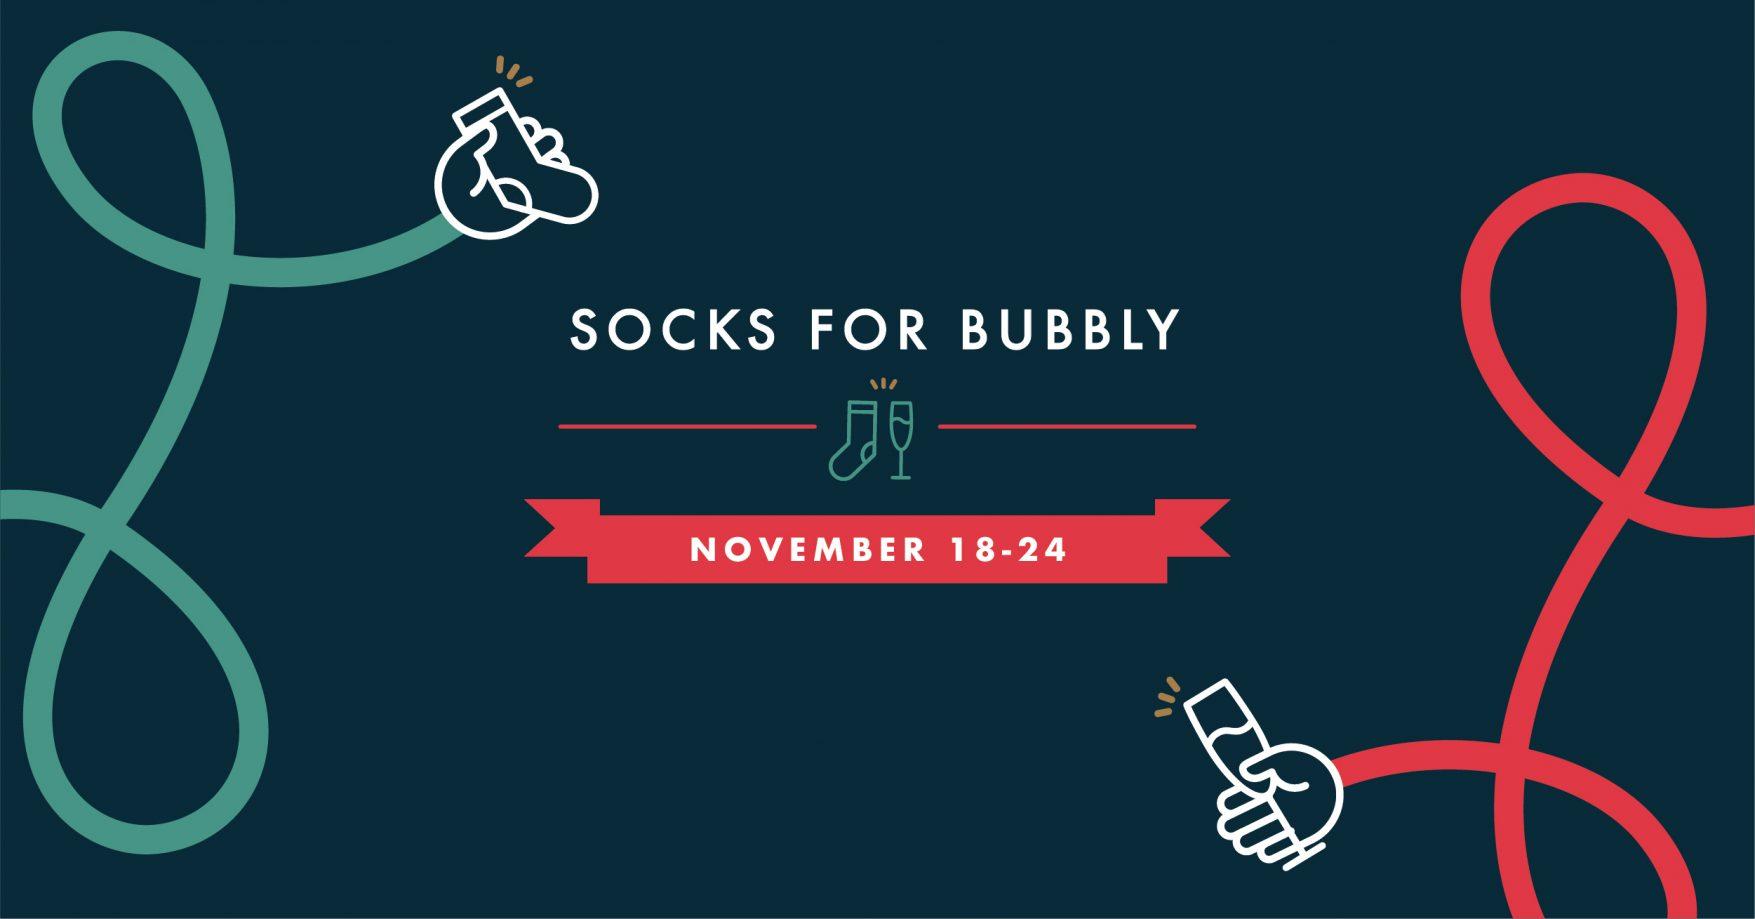 Socks for Bubbly 2019